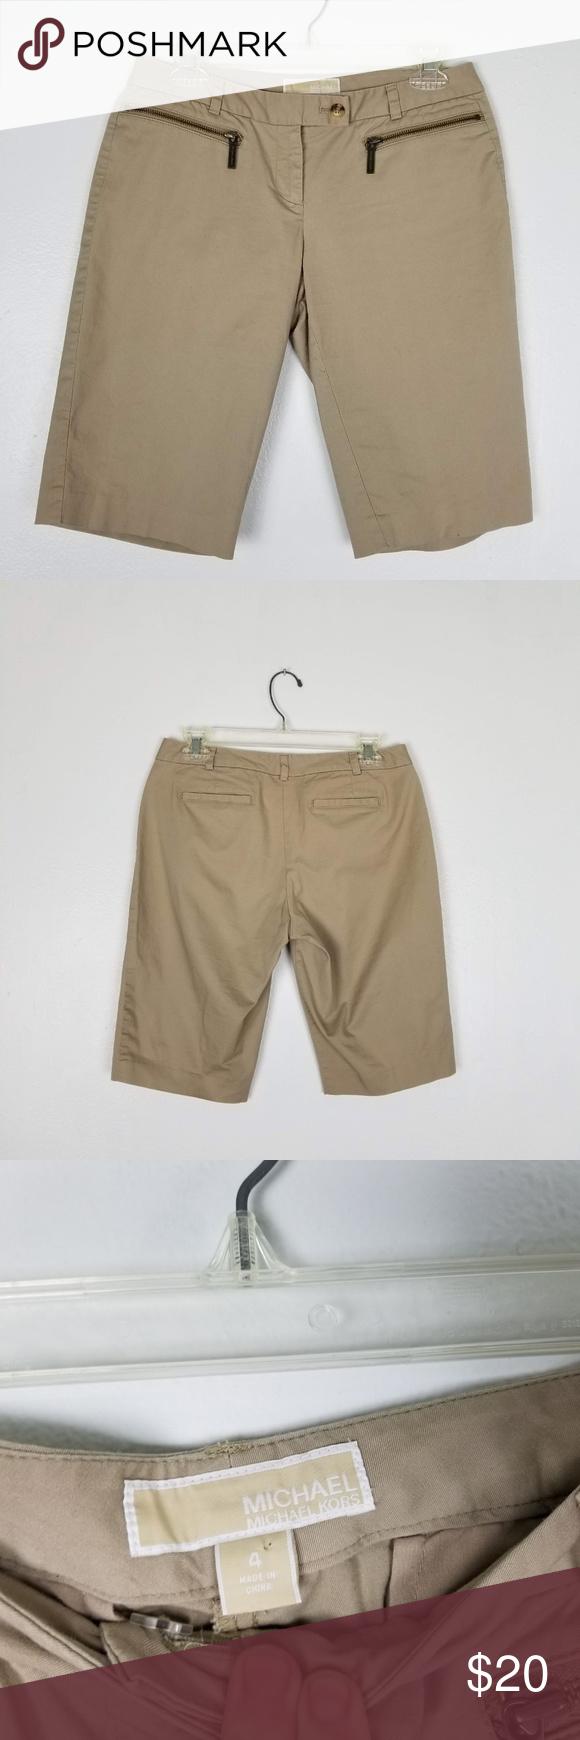 Classic Kors Style Bermuda Shorts Michael Great Of Khaki Pair hBrdtsCxQ